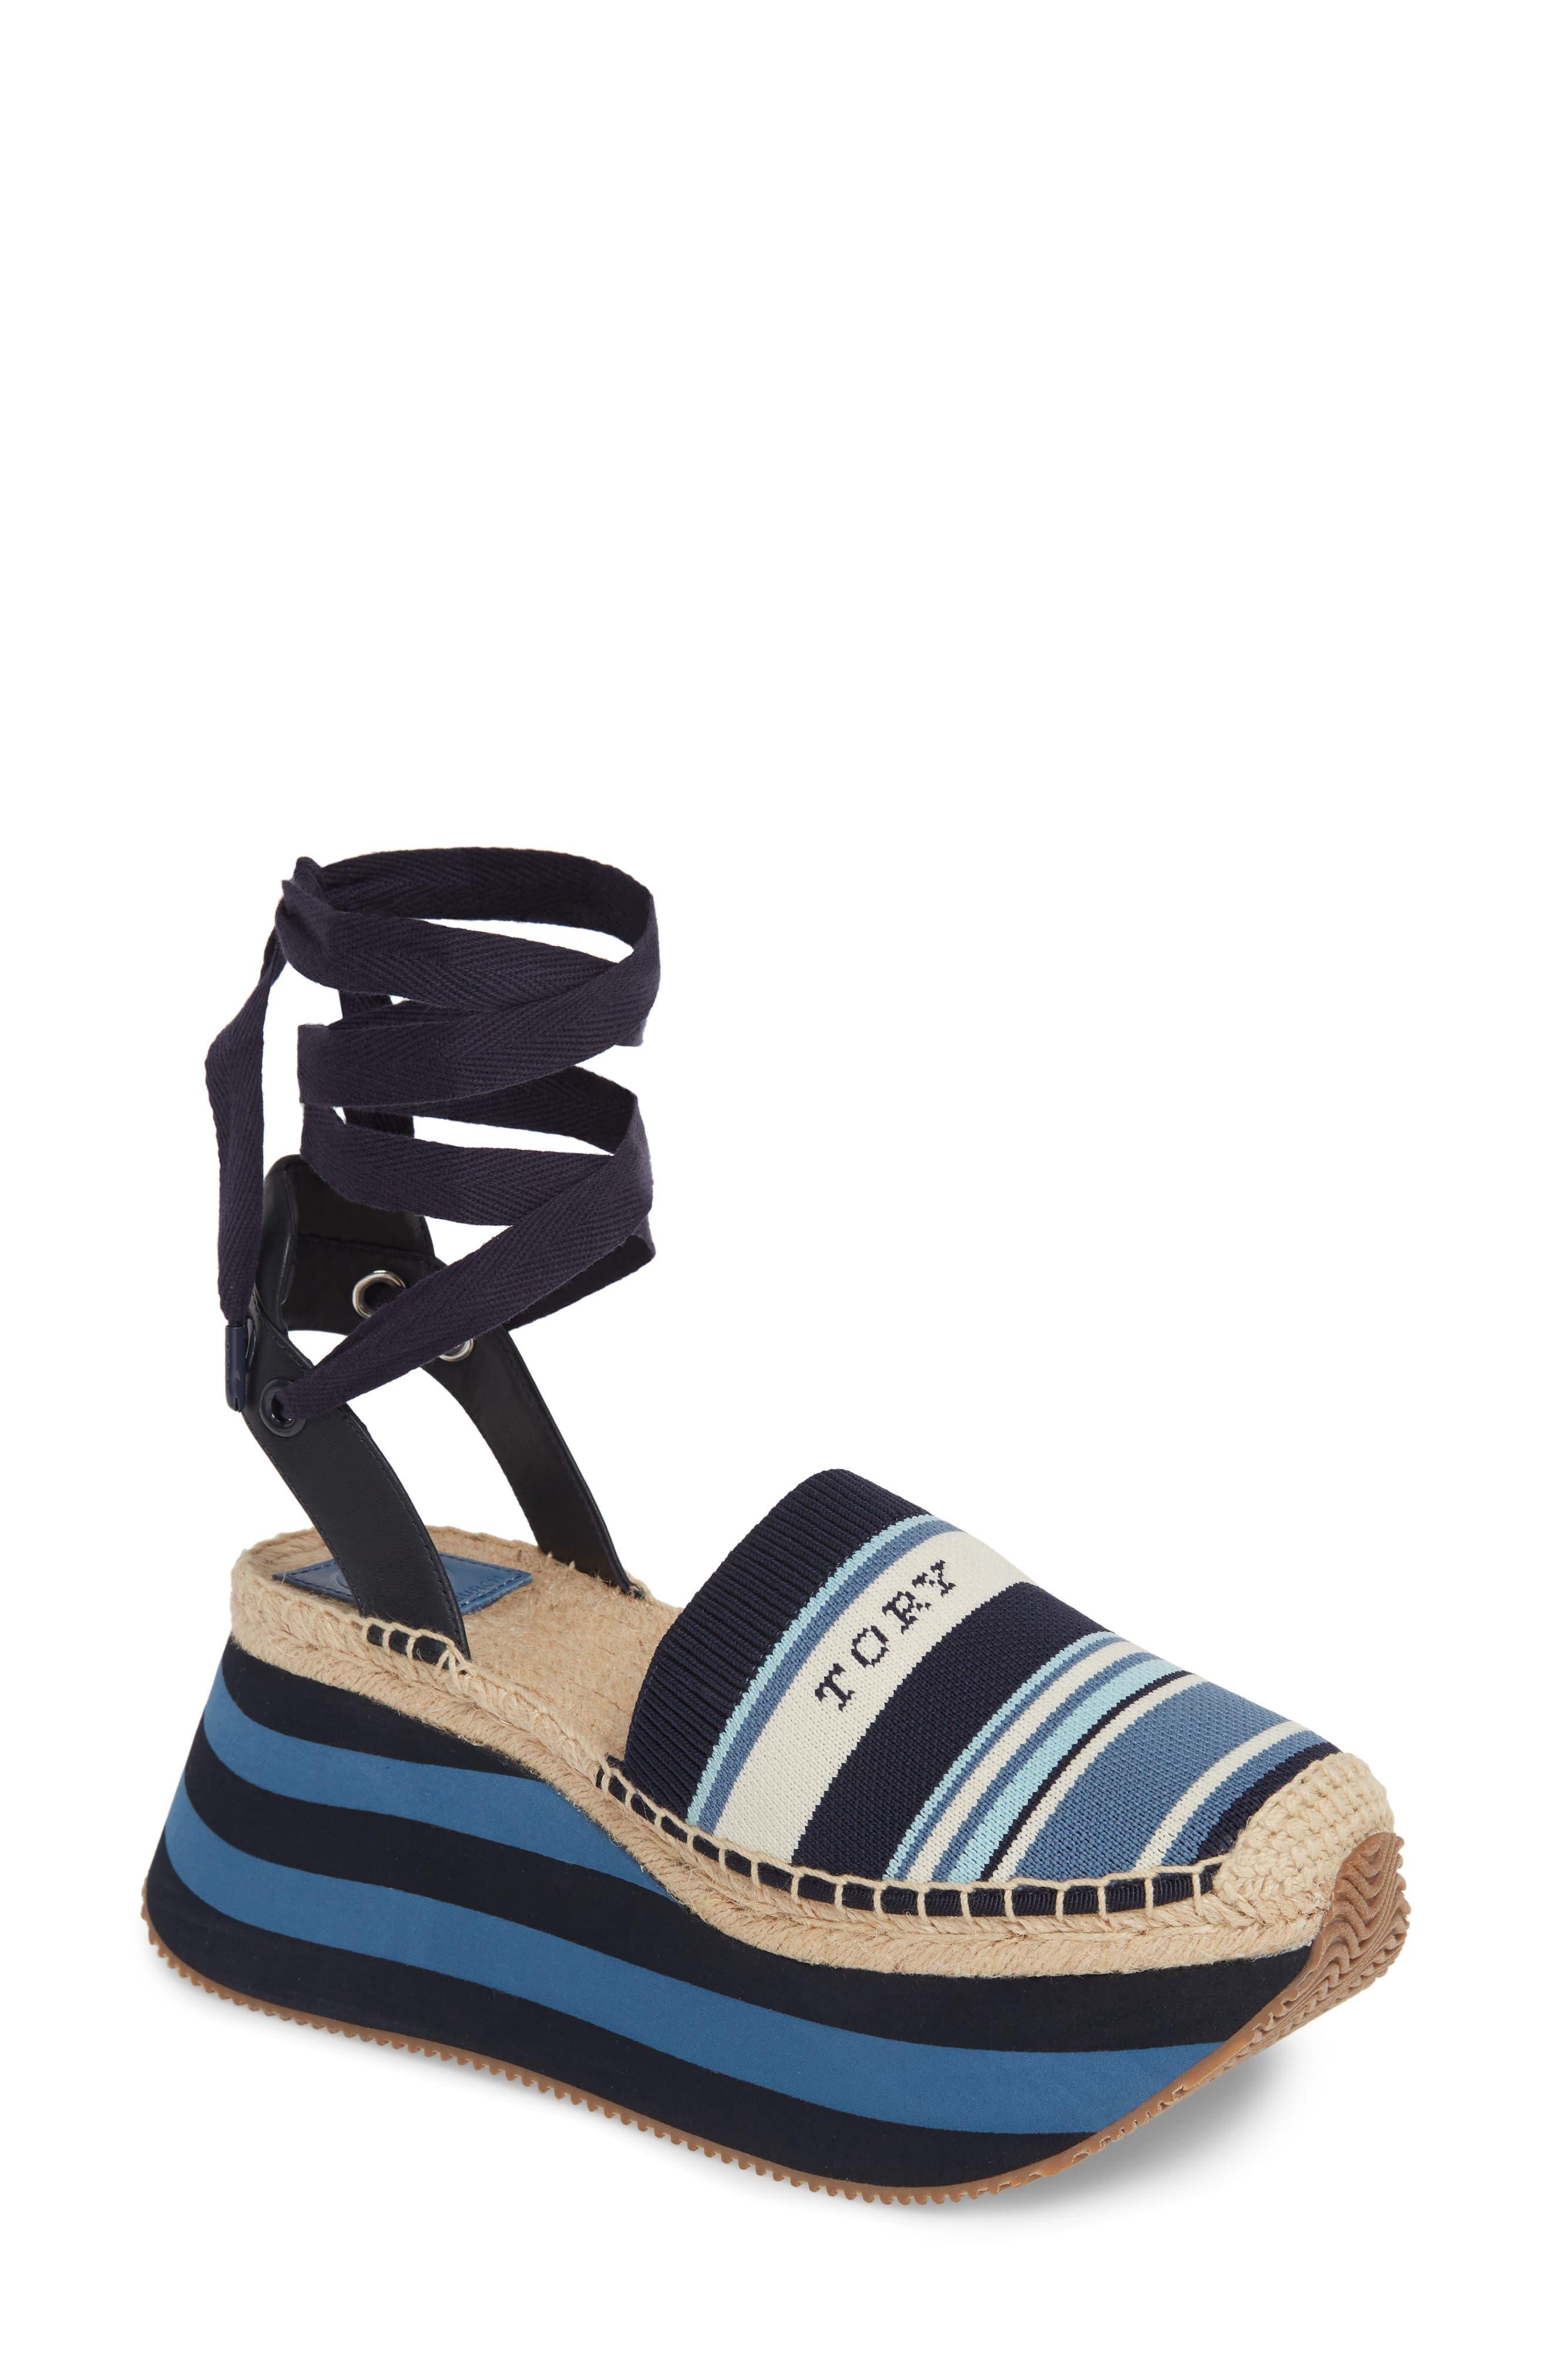 Tory Burch Daisy Lace-Up Platform Shoe, Blue